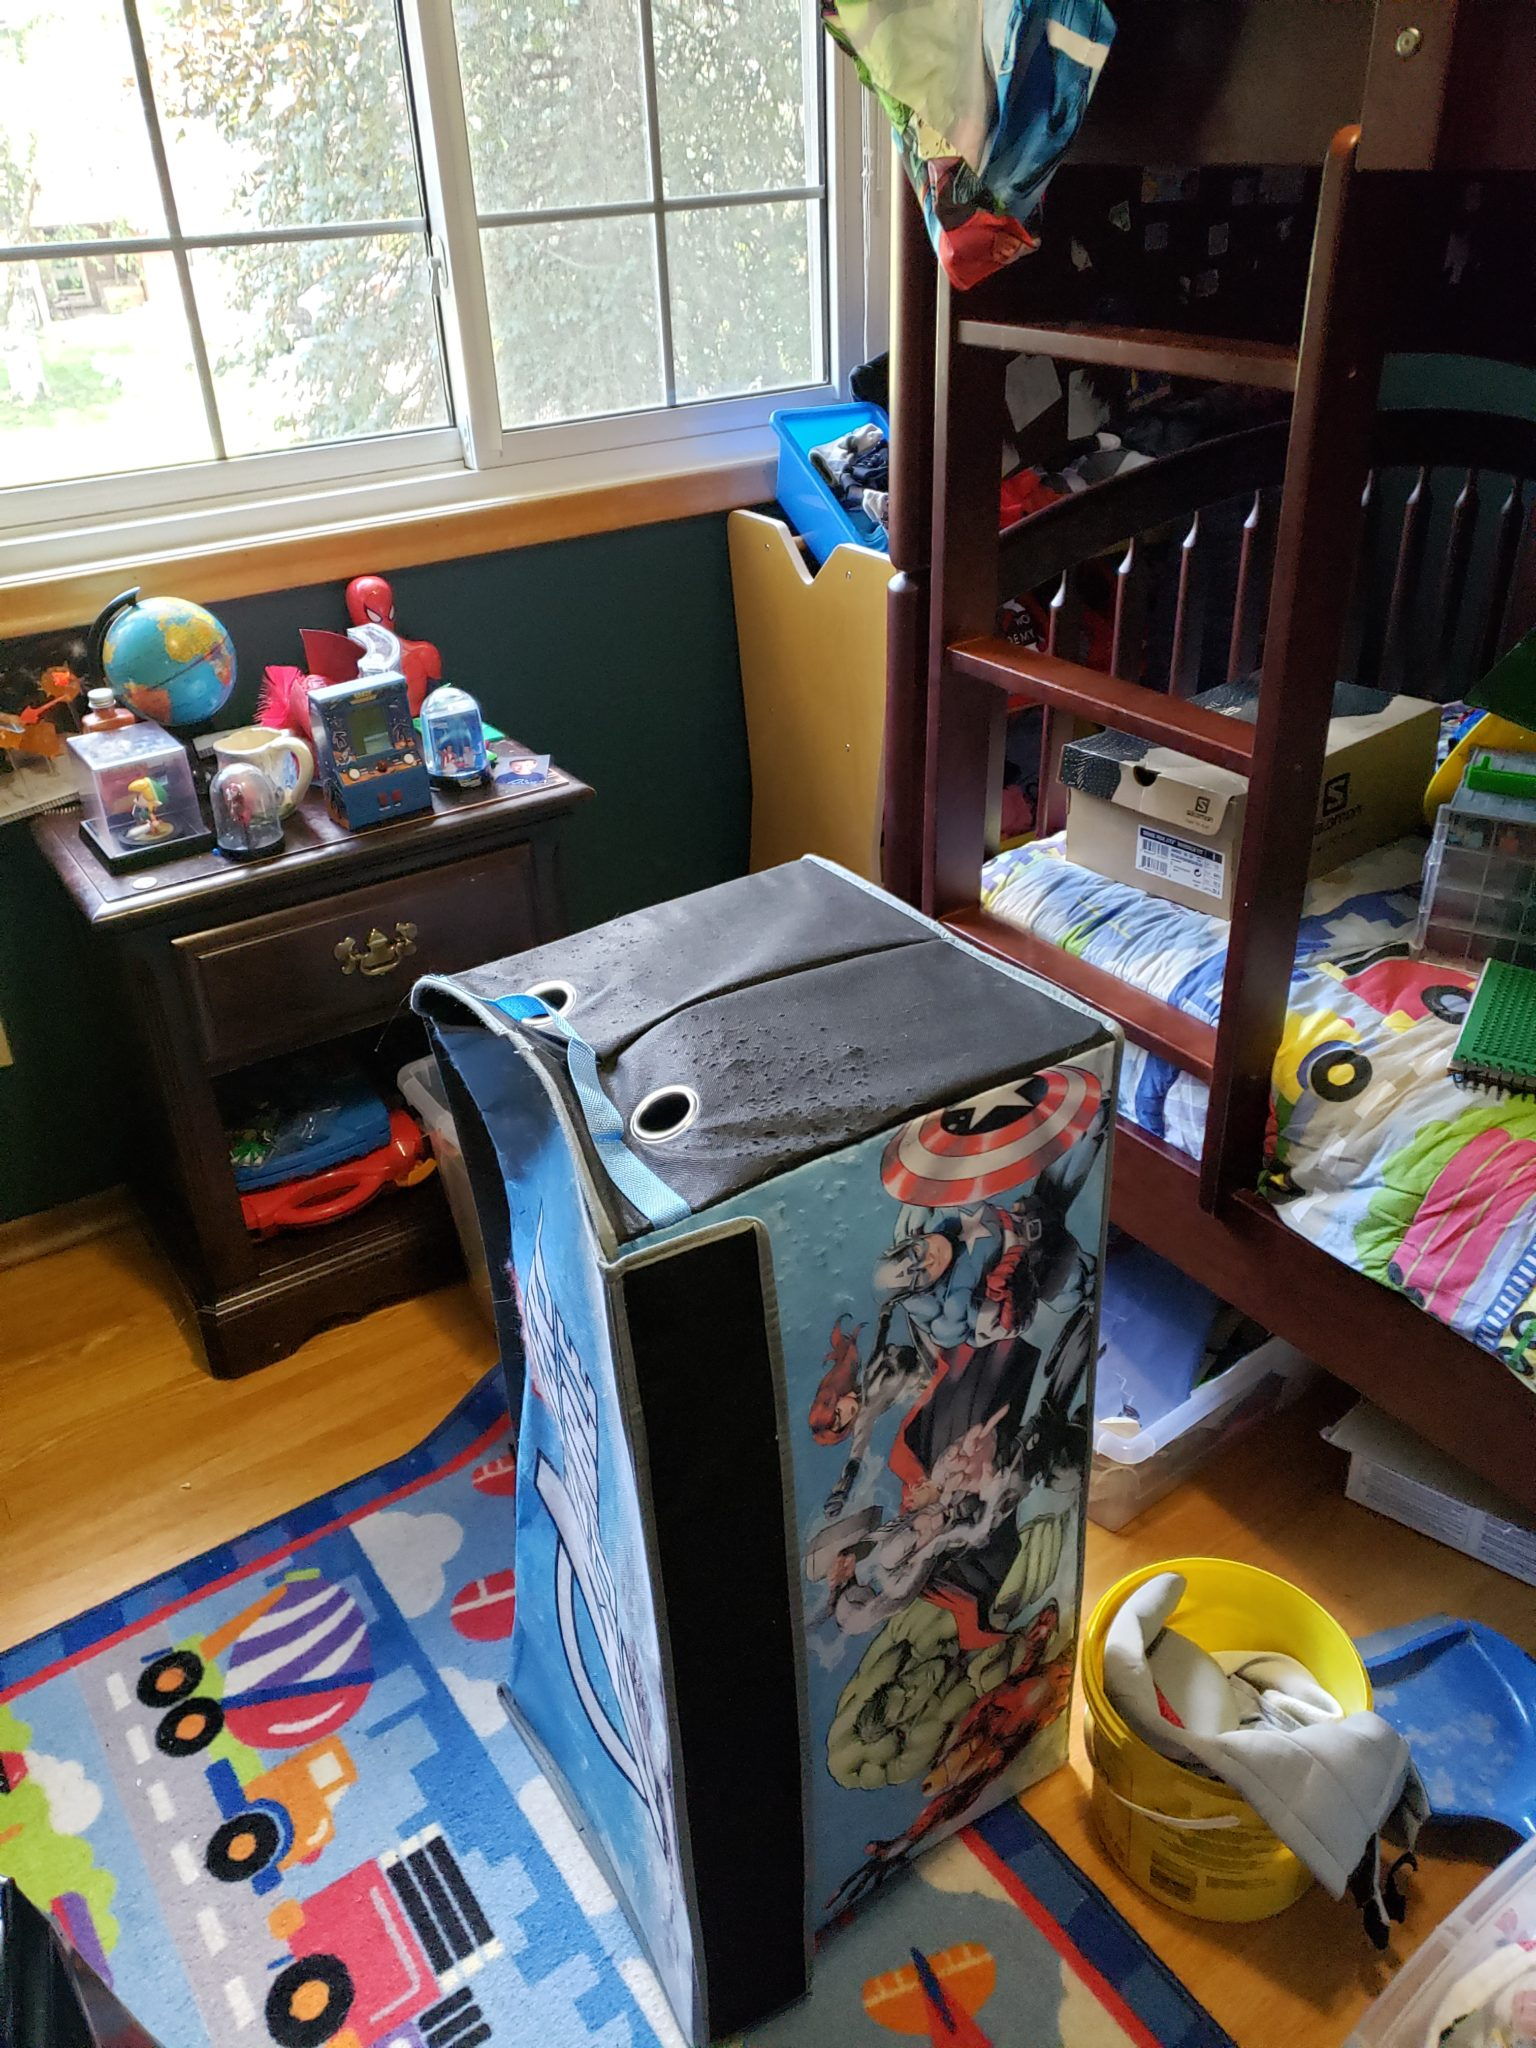 Child's bedroom - Before